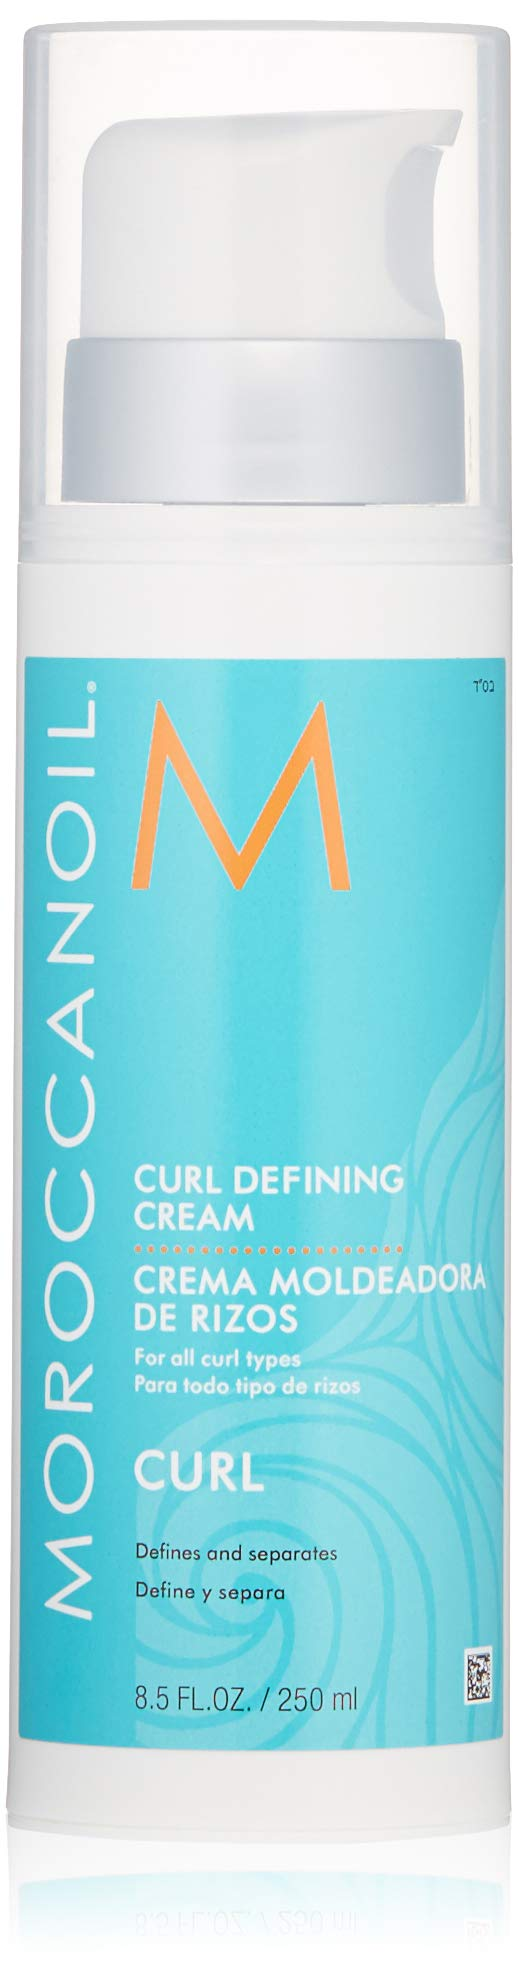 Moroccanoil Curl Defining Cream, 8.5 Fl. Oz. by MOROCCANOIL (Image #1)